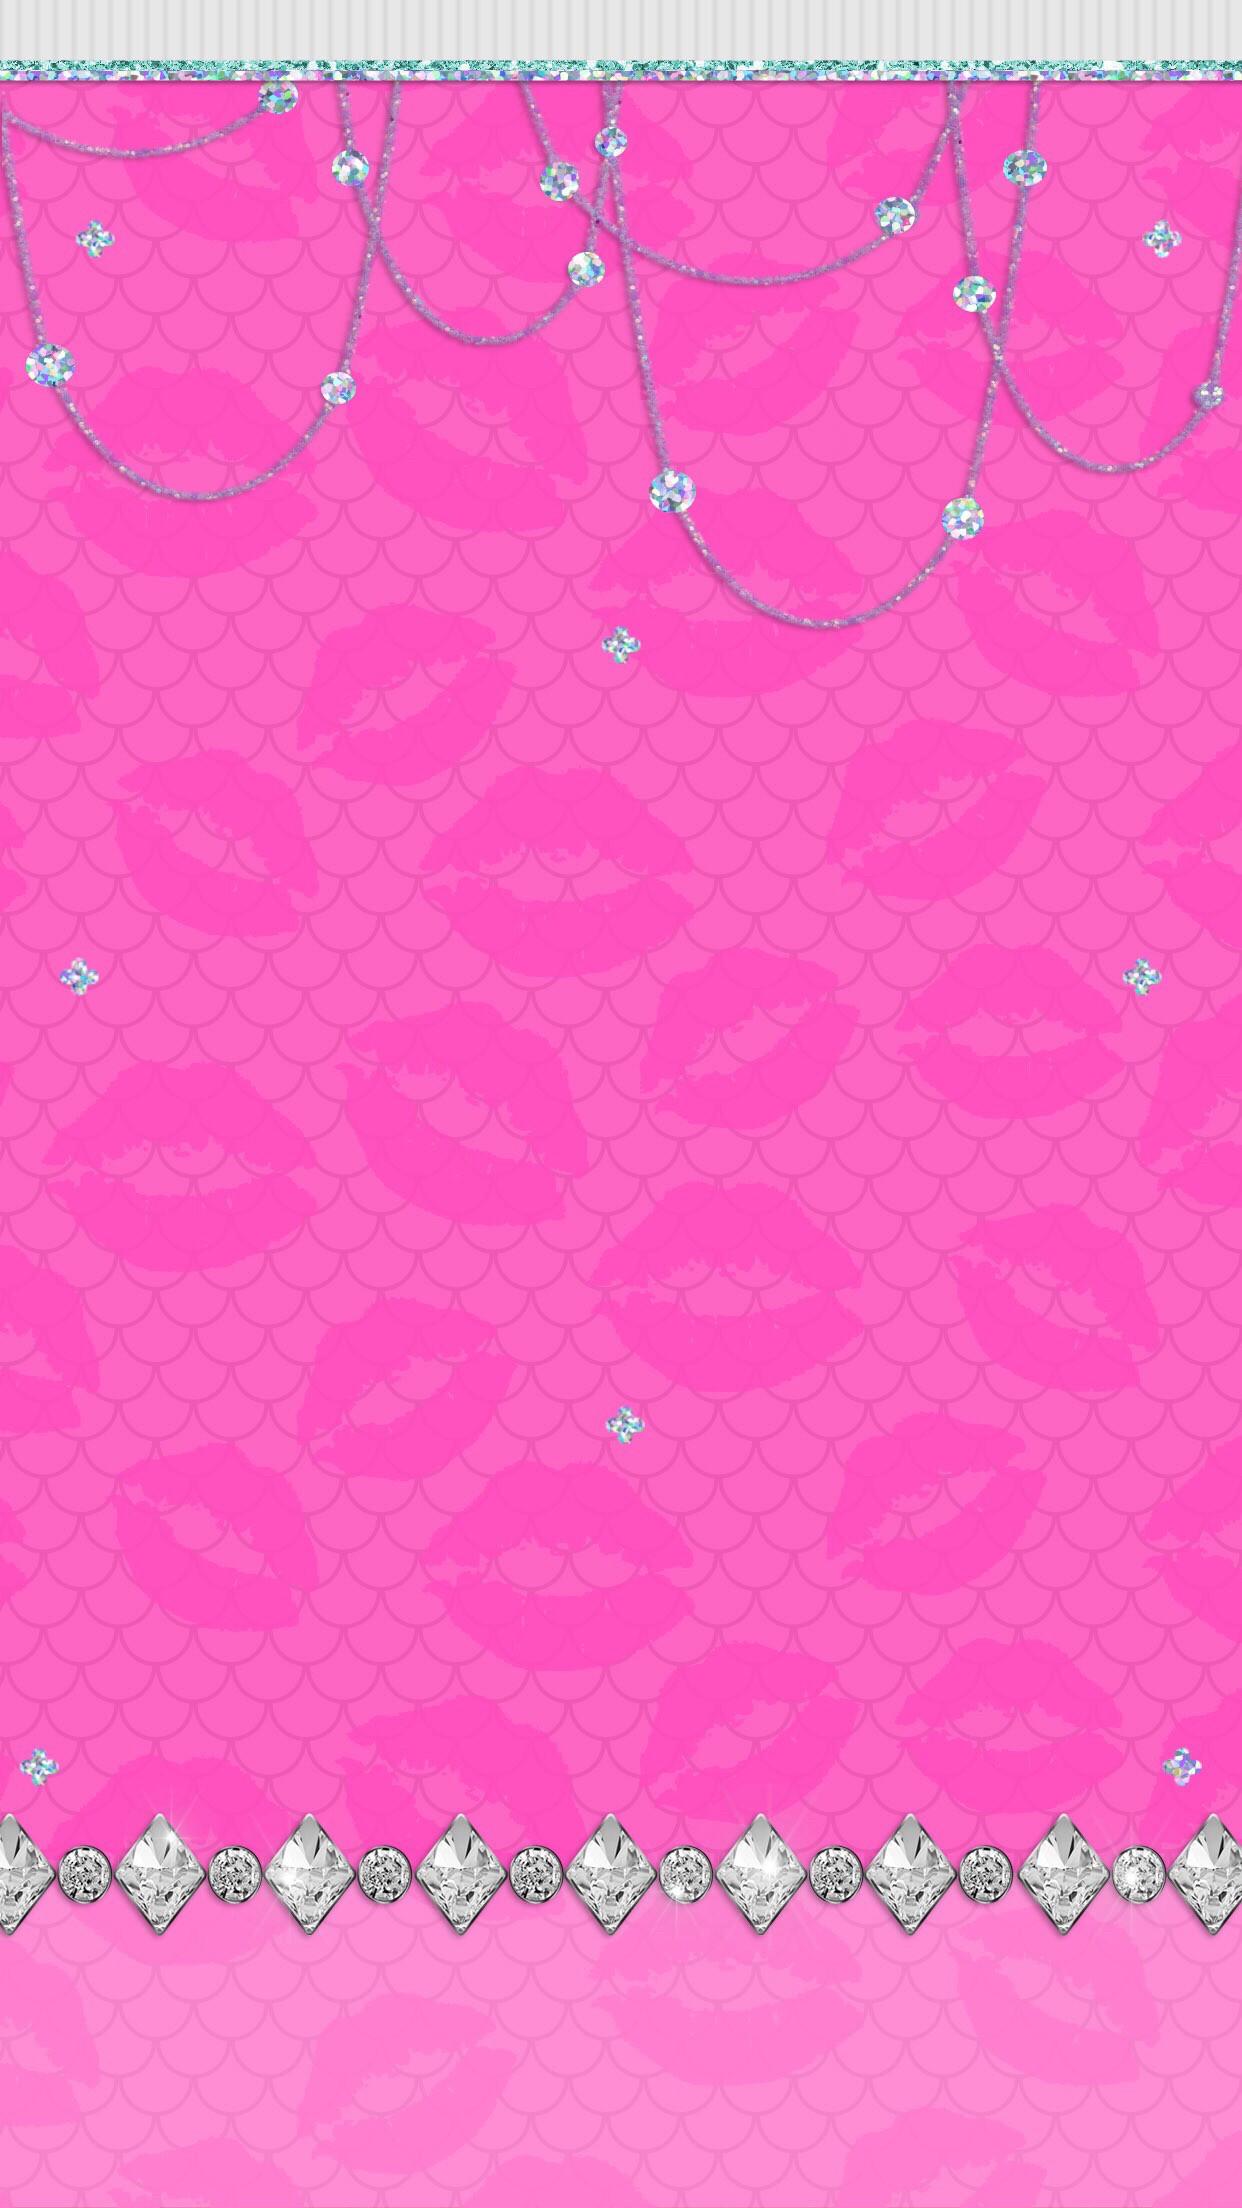 Glitter Wallpaper, Pink Wallpaper, Mobile Wallpaper, Wallpaper Backgrounds,  Phone Wallpapers, Iphone 2, Valentines Day, Kawaii, Mermaids